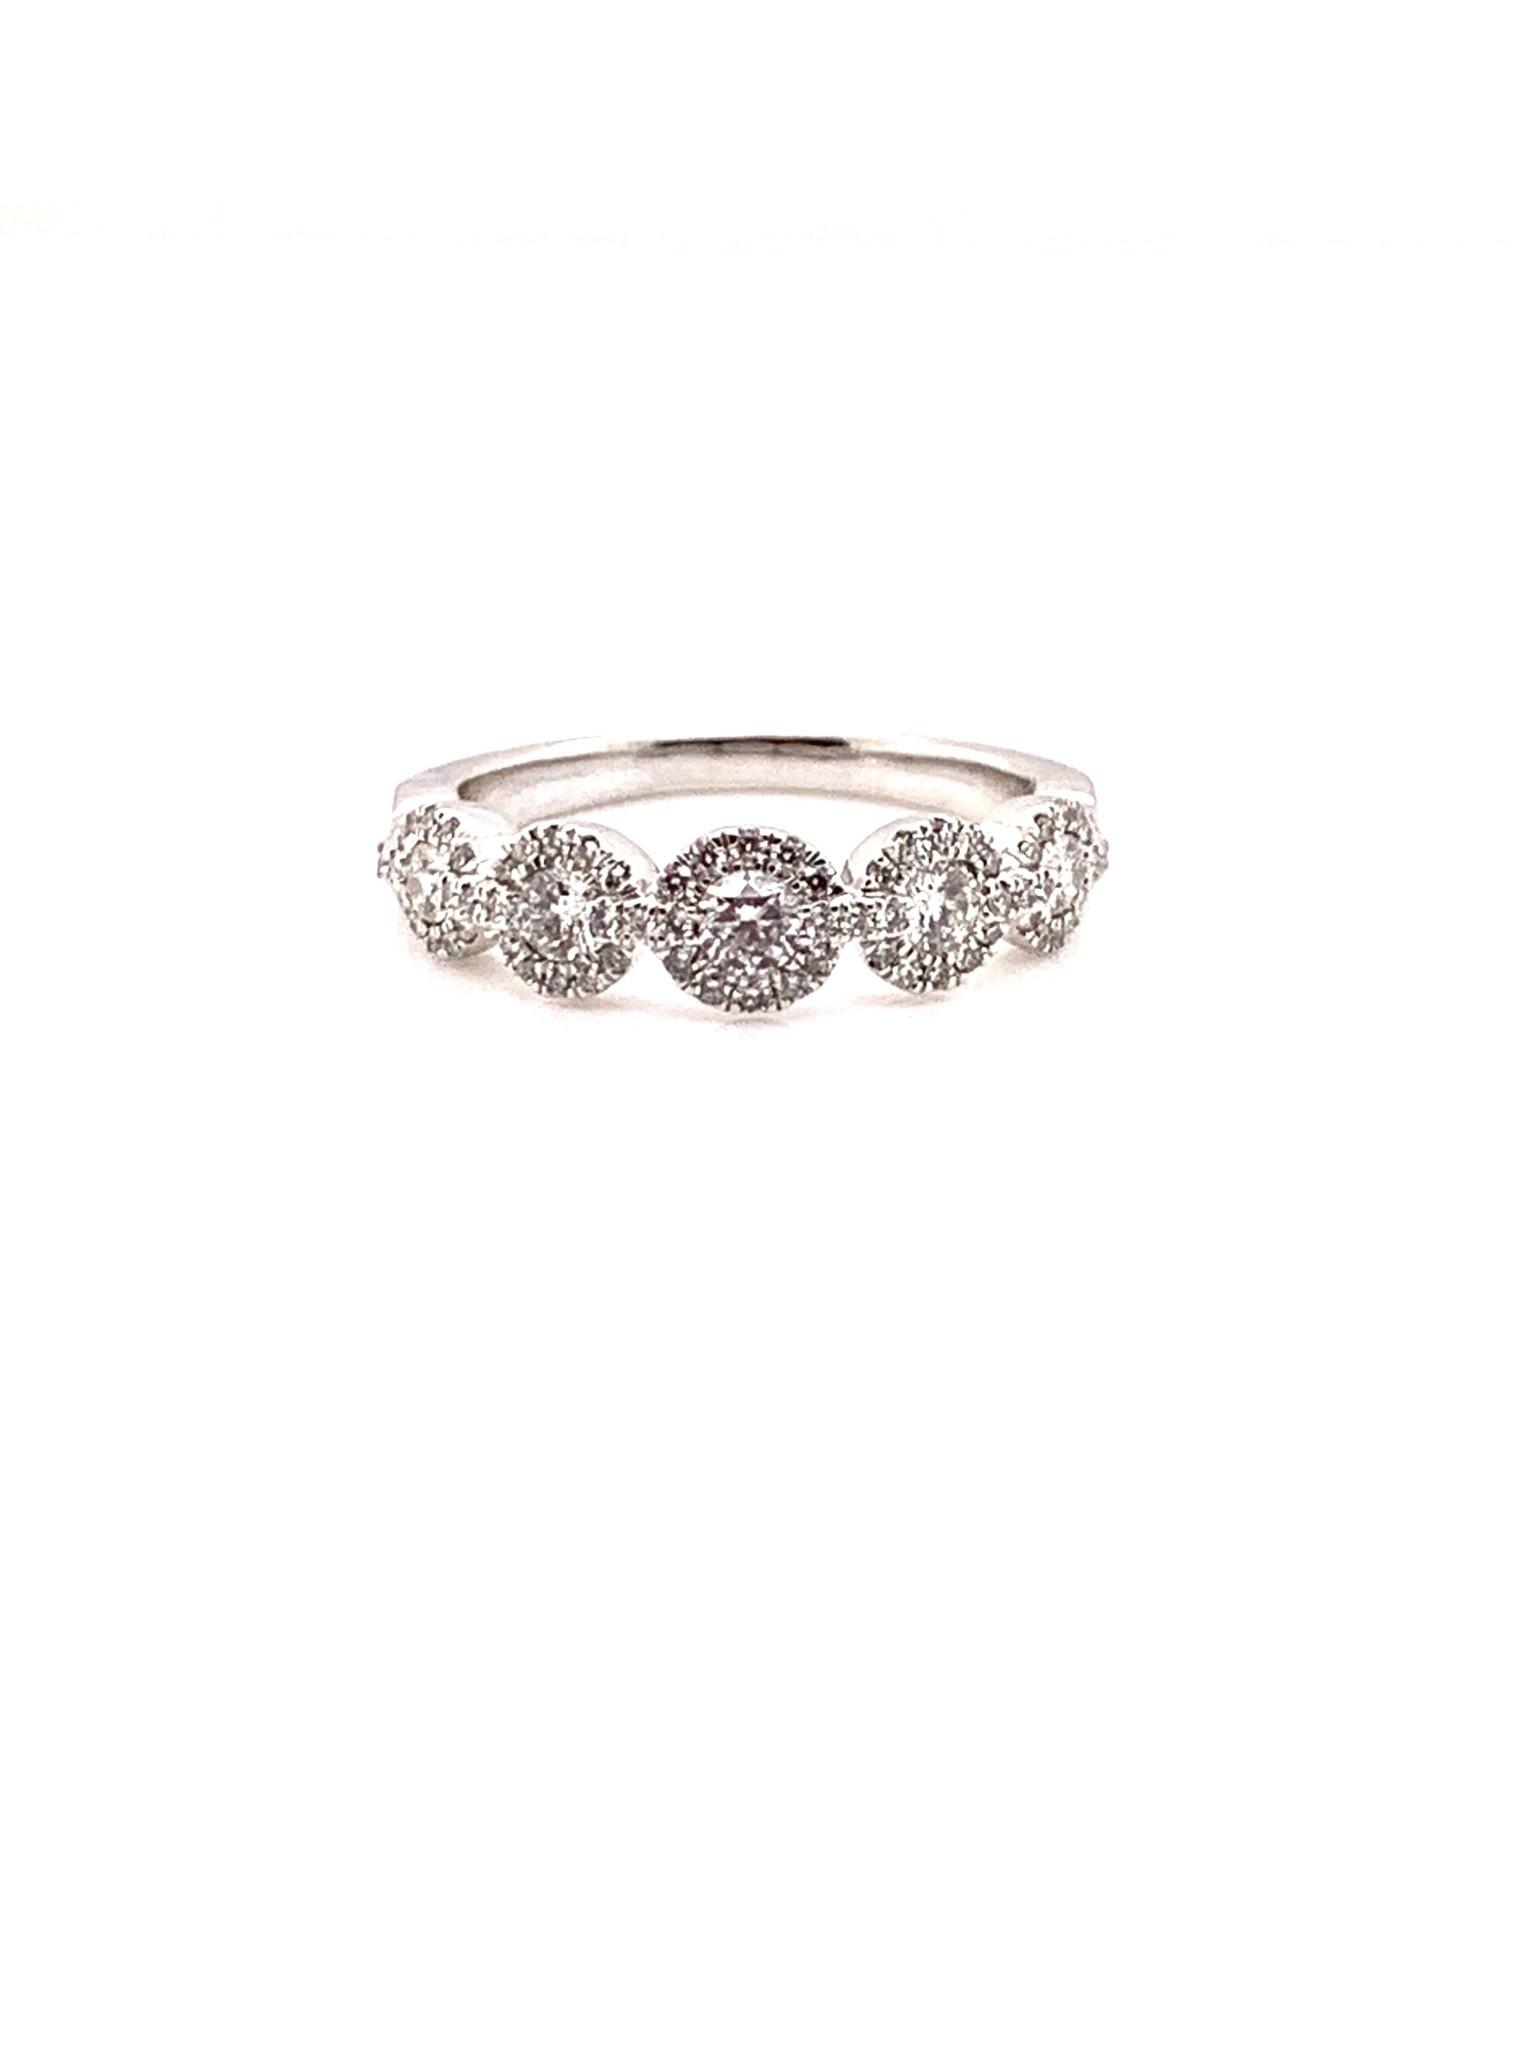 14K white gold diamond band 0.625ct